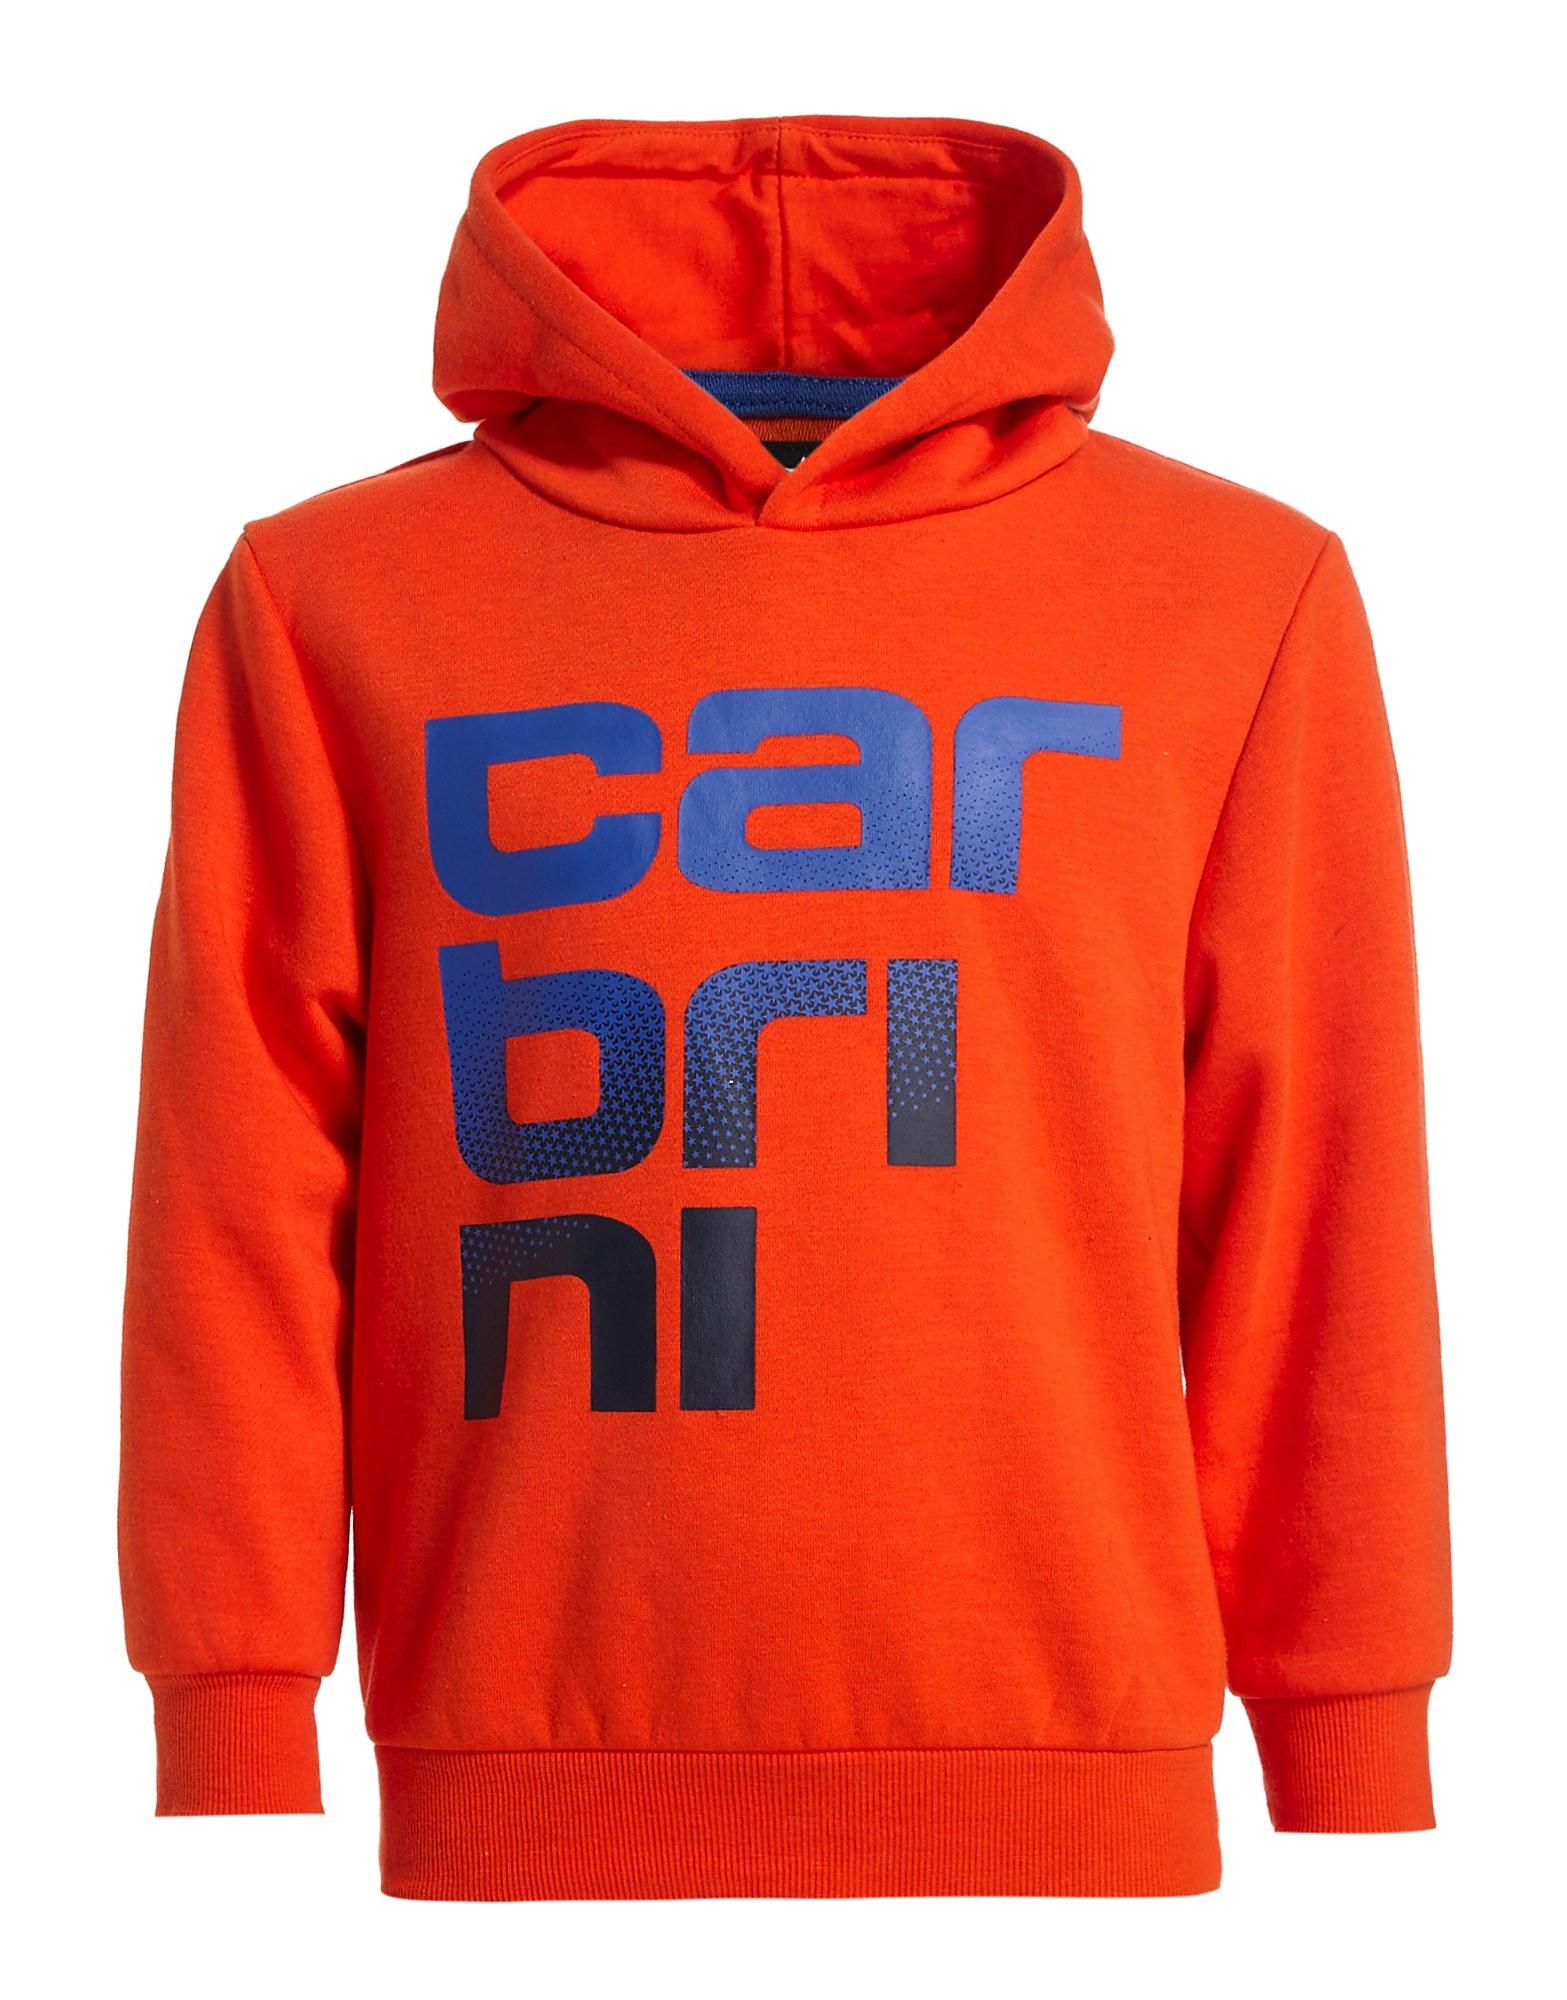 Carbrini Rocket Print Hoody Children